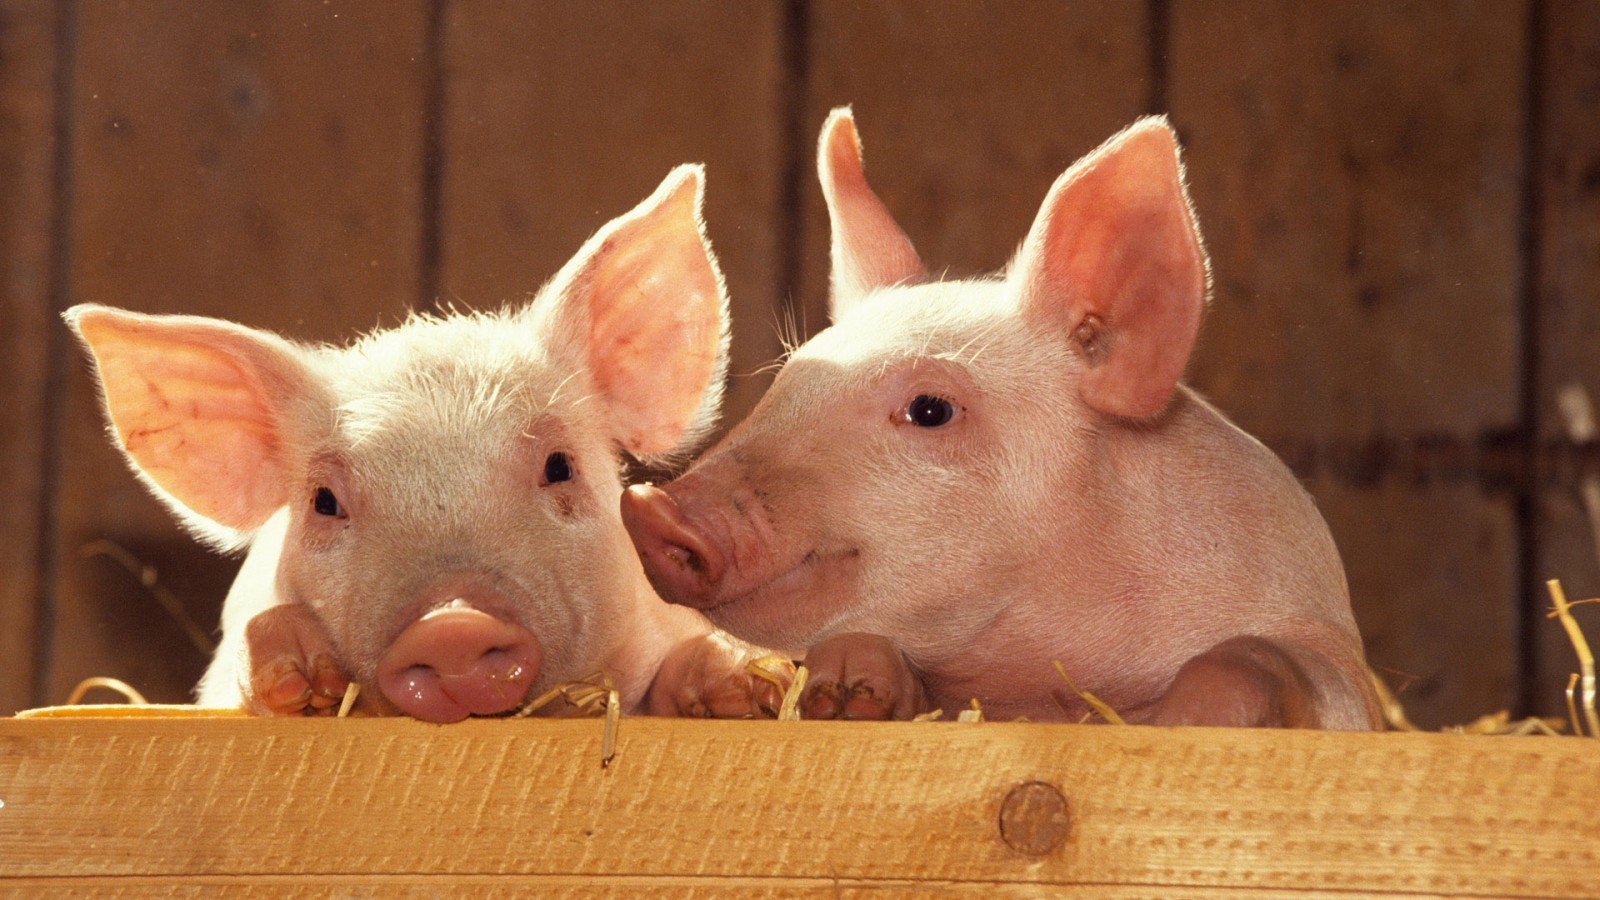 Animal   Pig Pigs Cute Wallpaper 1600x900